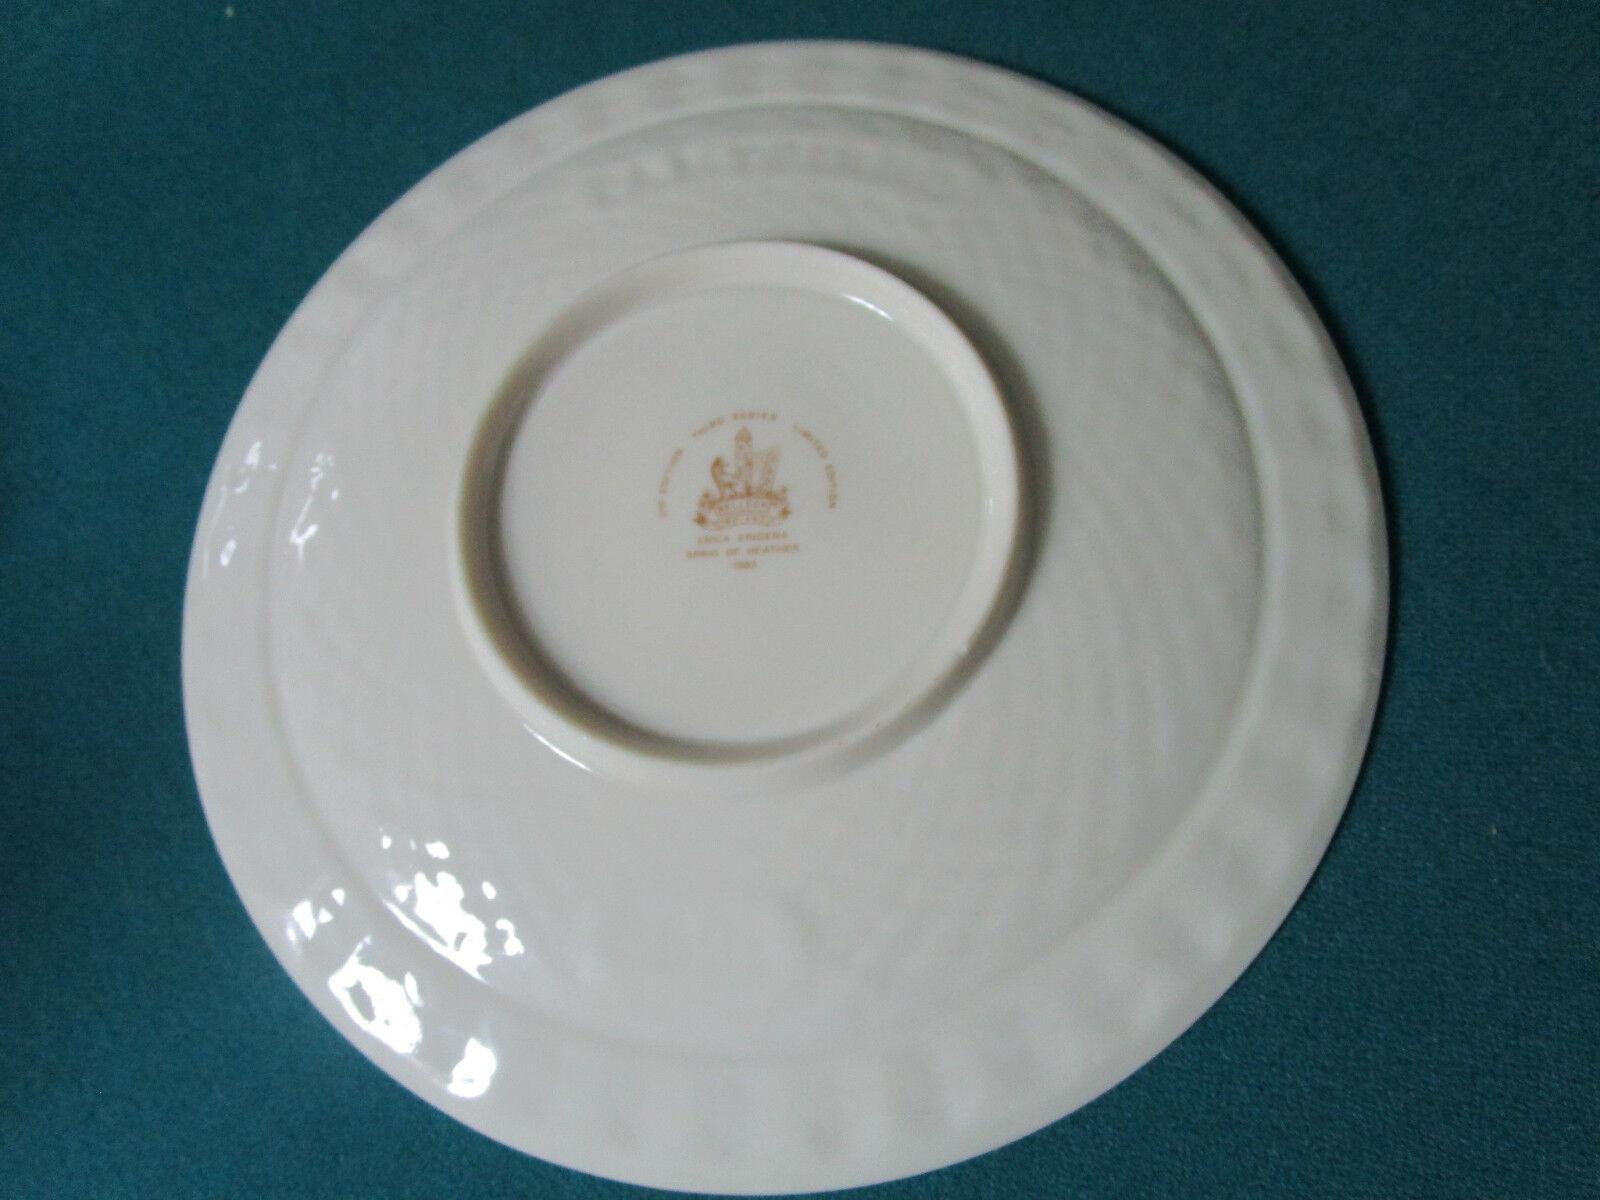 Irish Heather /' Belleek Plate Cabinet  Plate Superb Condition Vintage Belleek Christmas 1985 Plate 9 Diameter